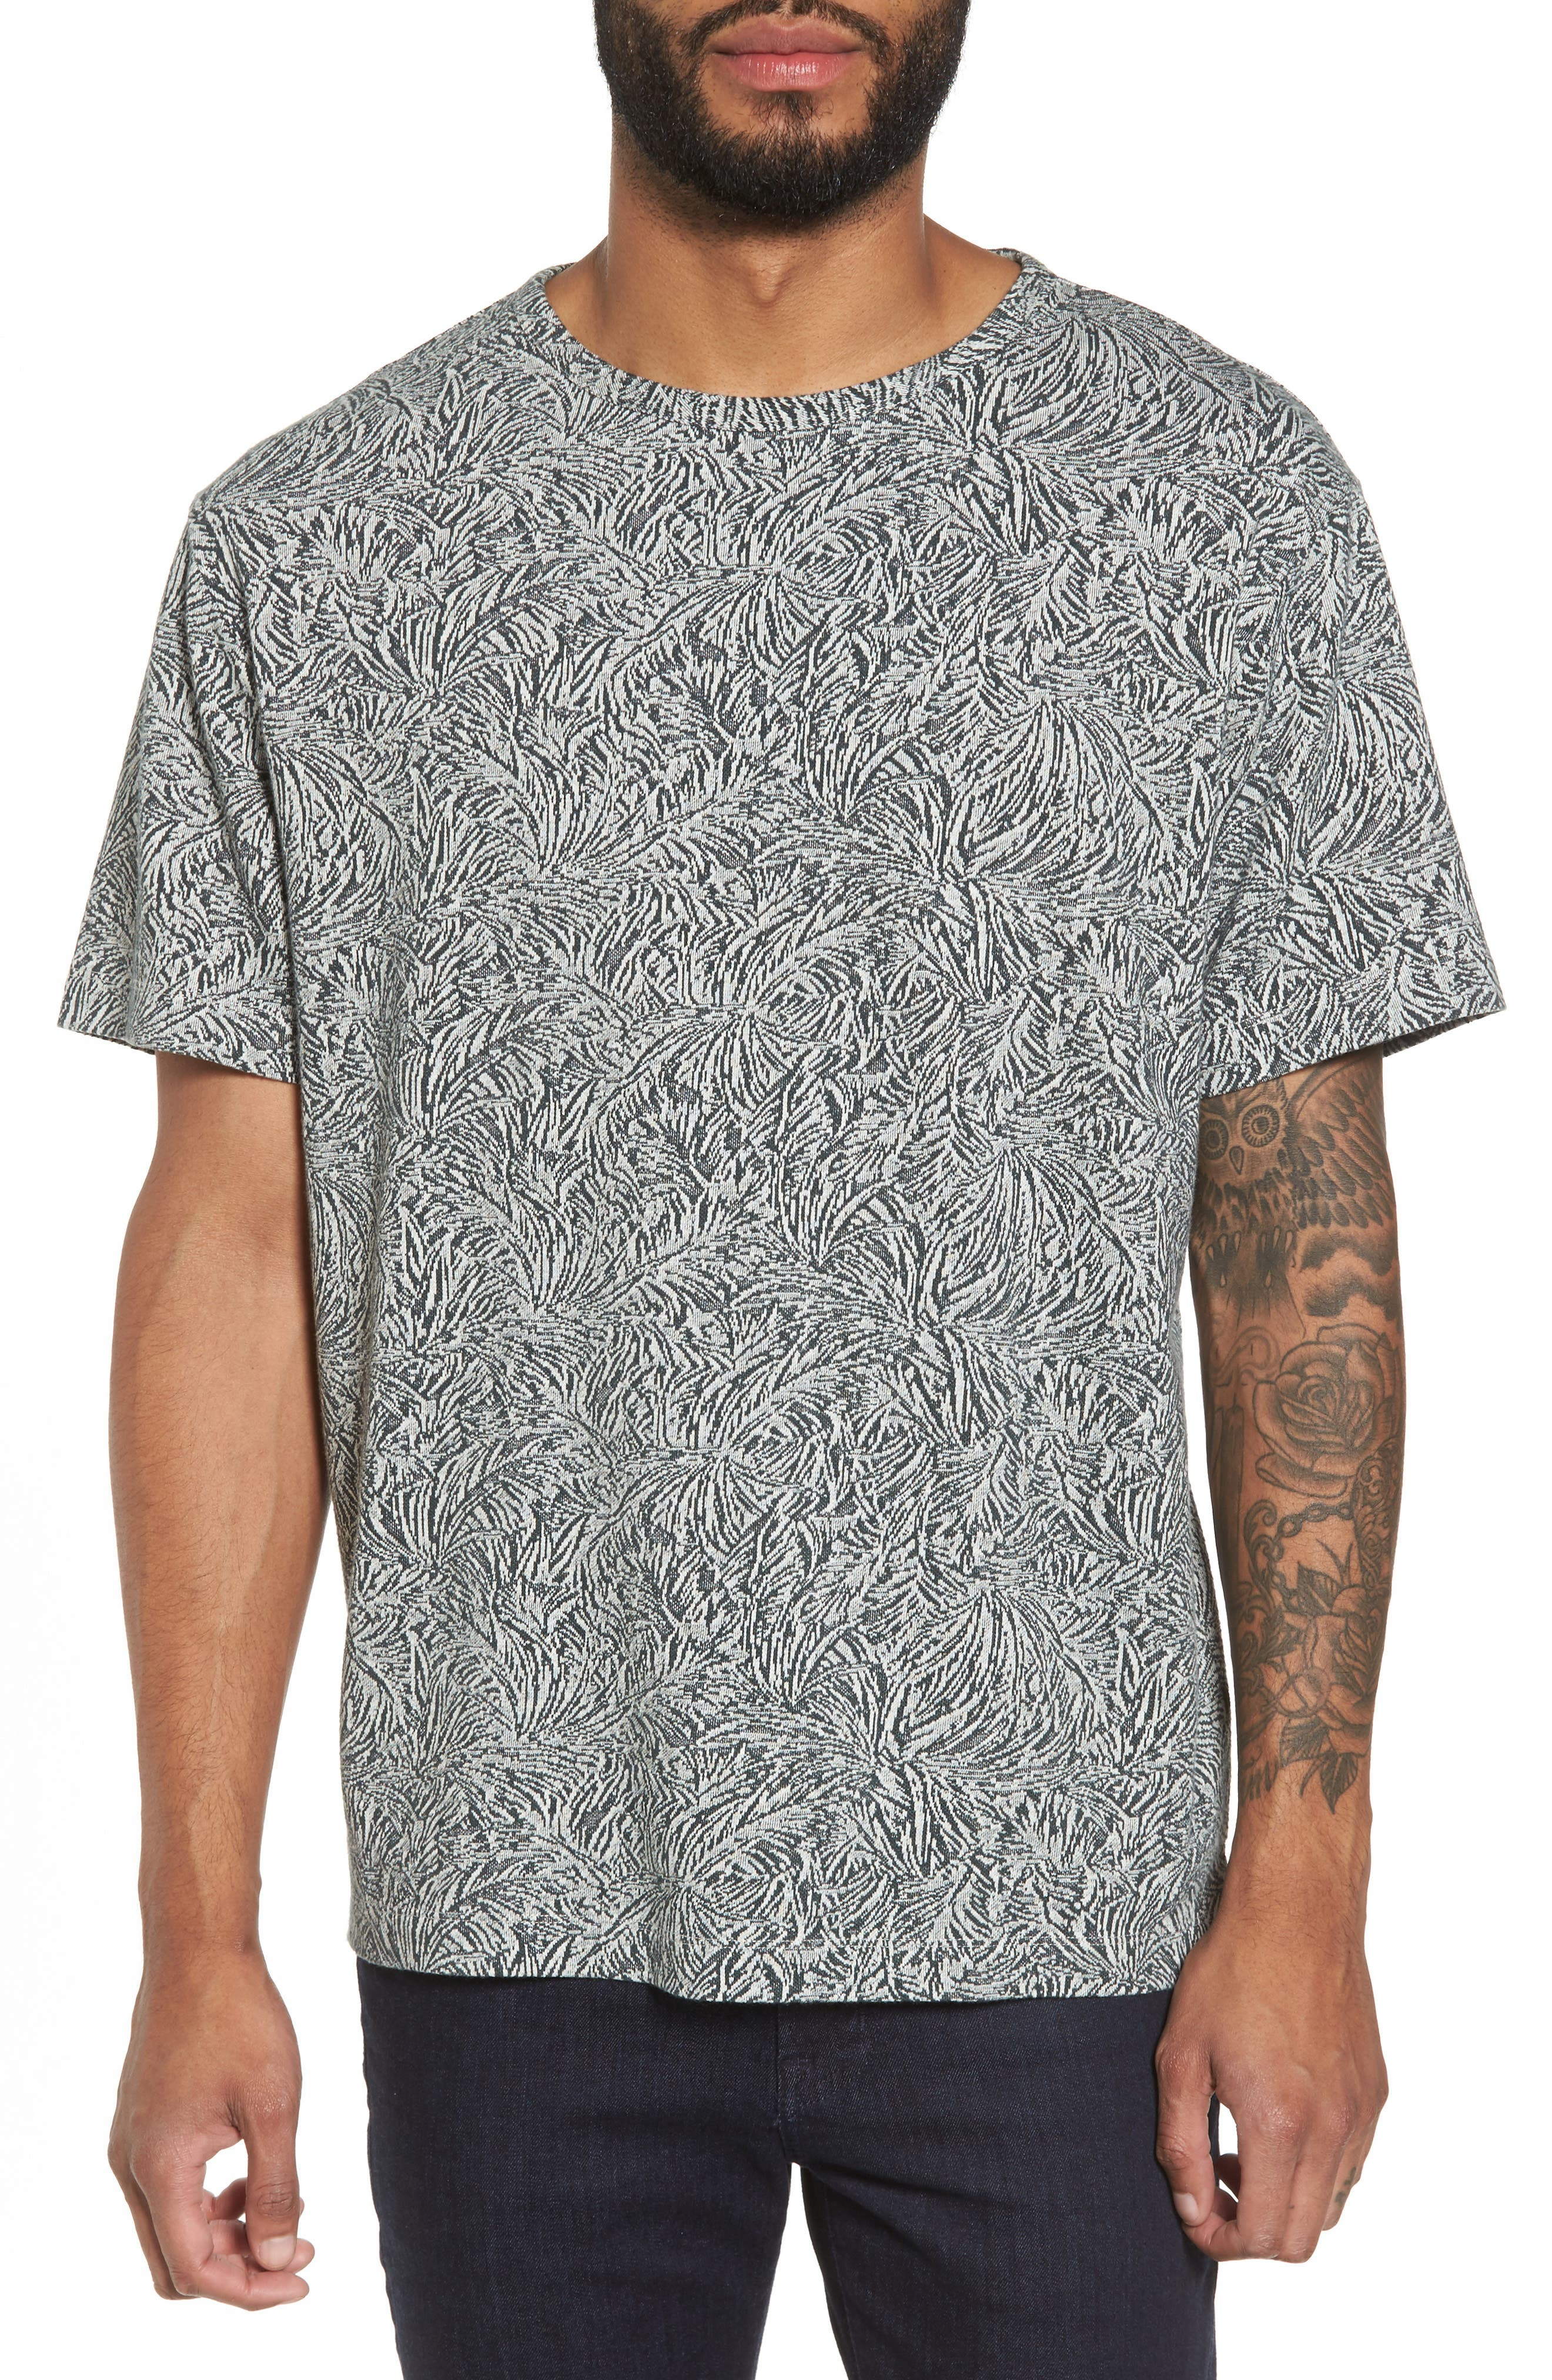 Main Image - Theory Palm Jacquard Crewneck T-Shirt